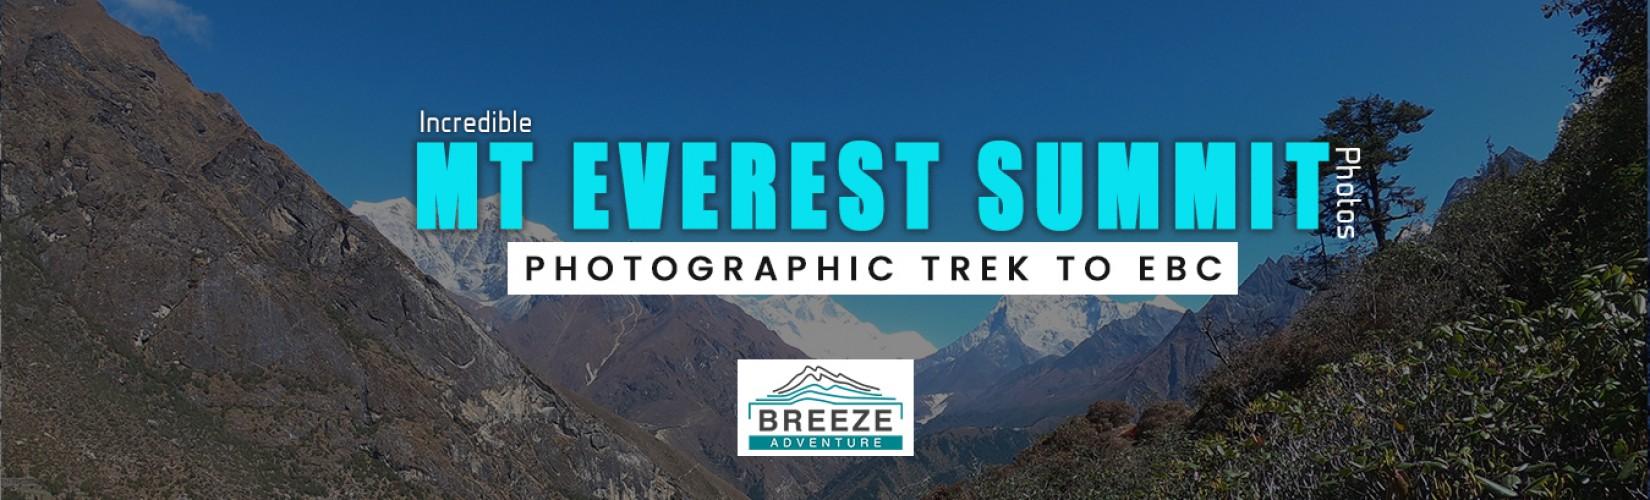 mt everest summit photos